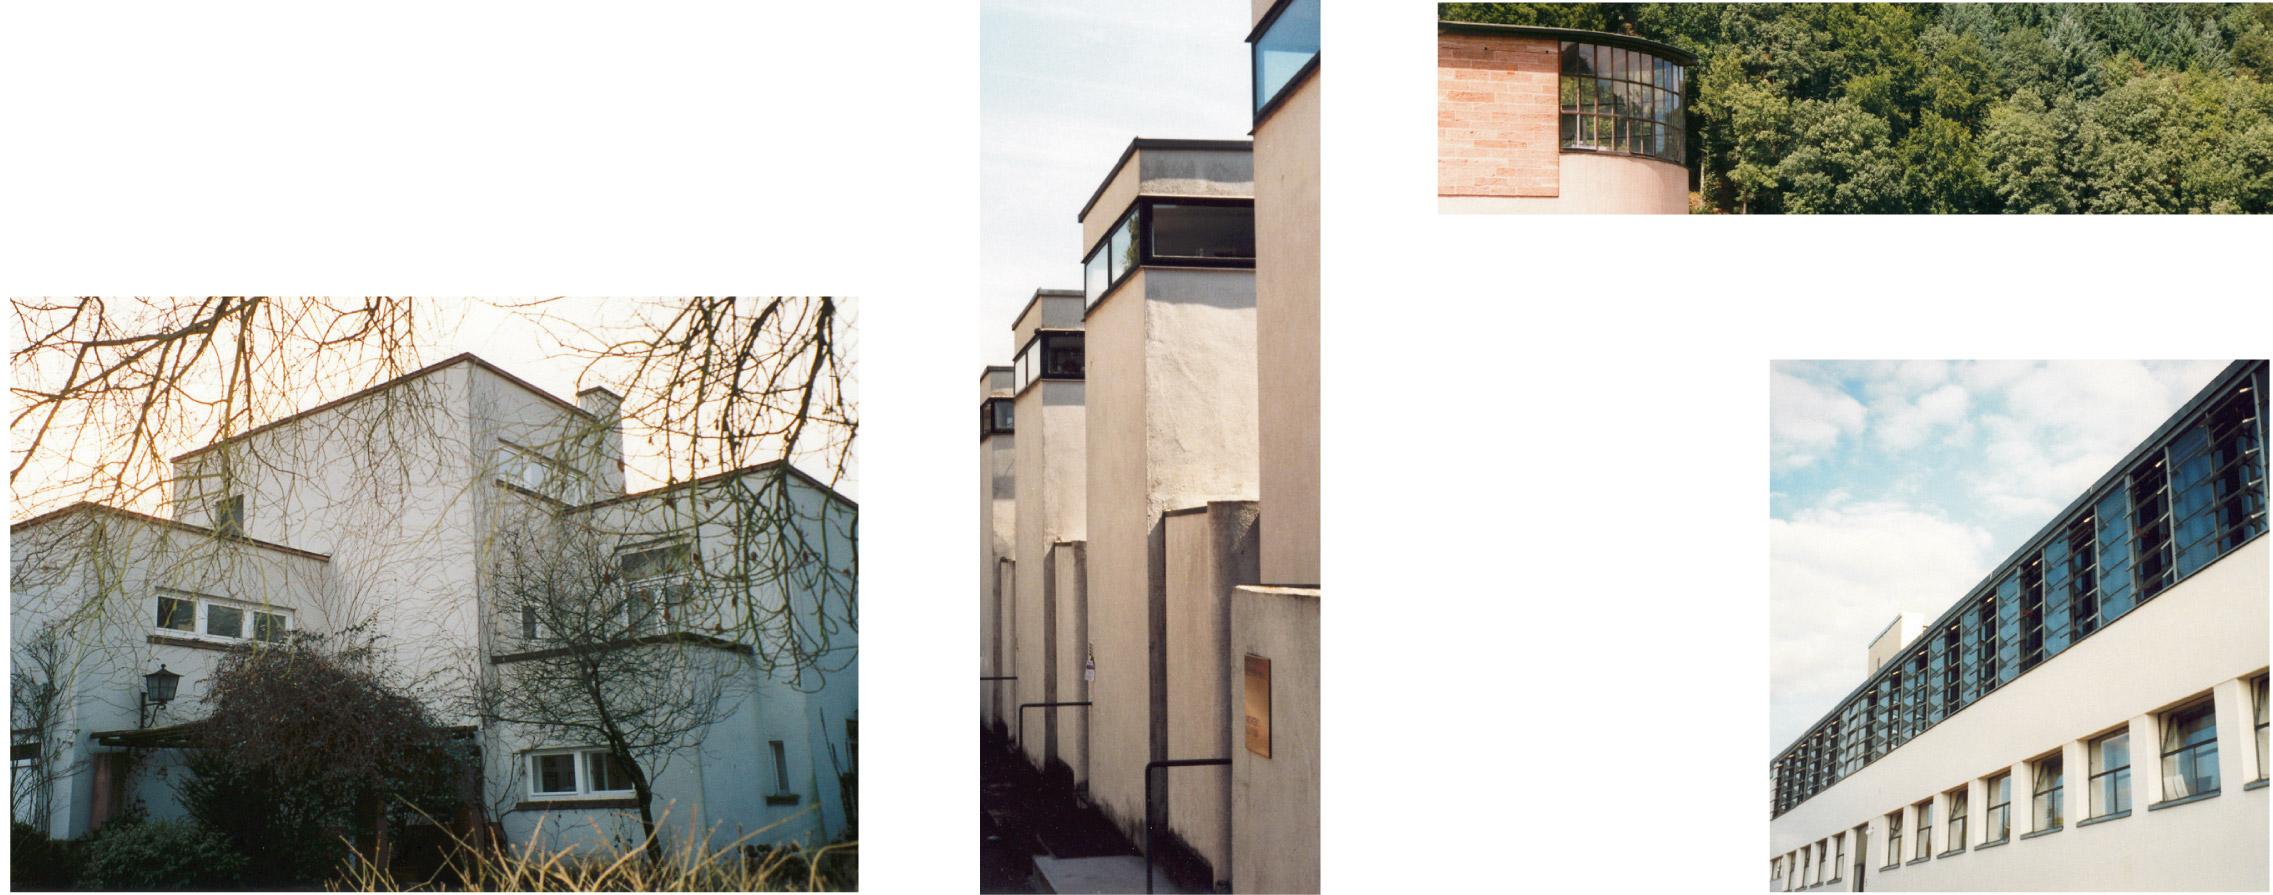 Klassische moderne baden w rttemberg for Klassische moderne